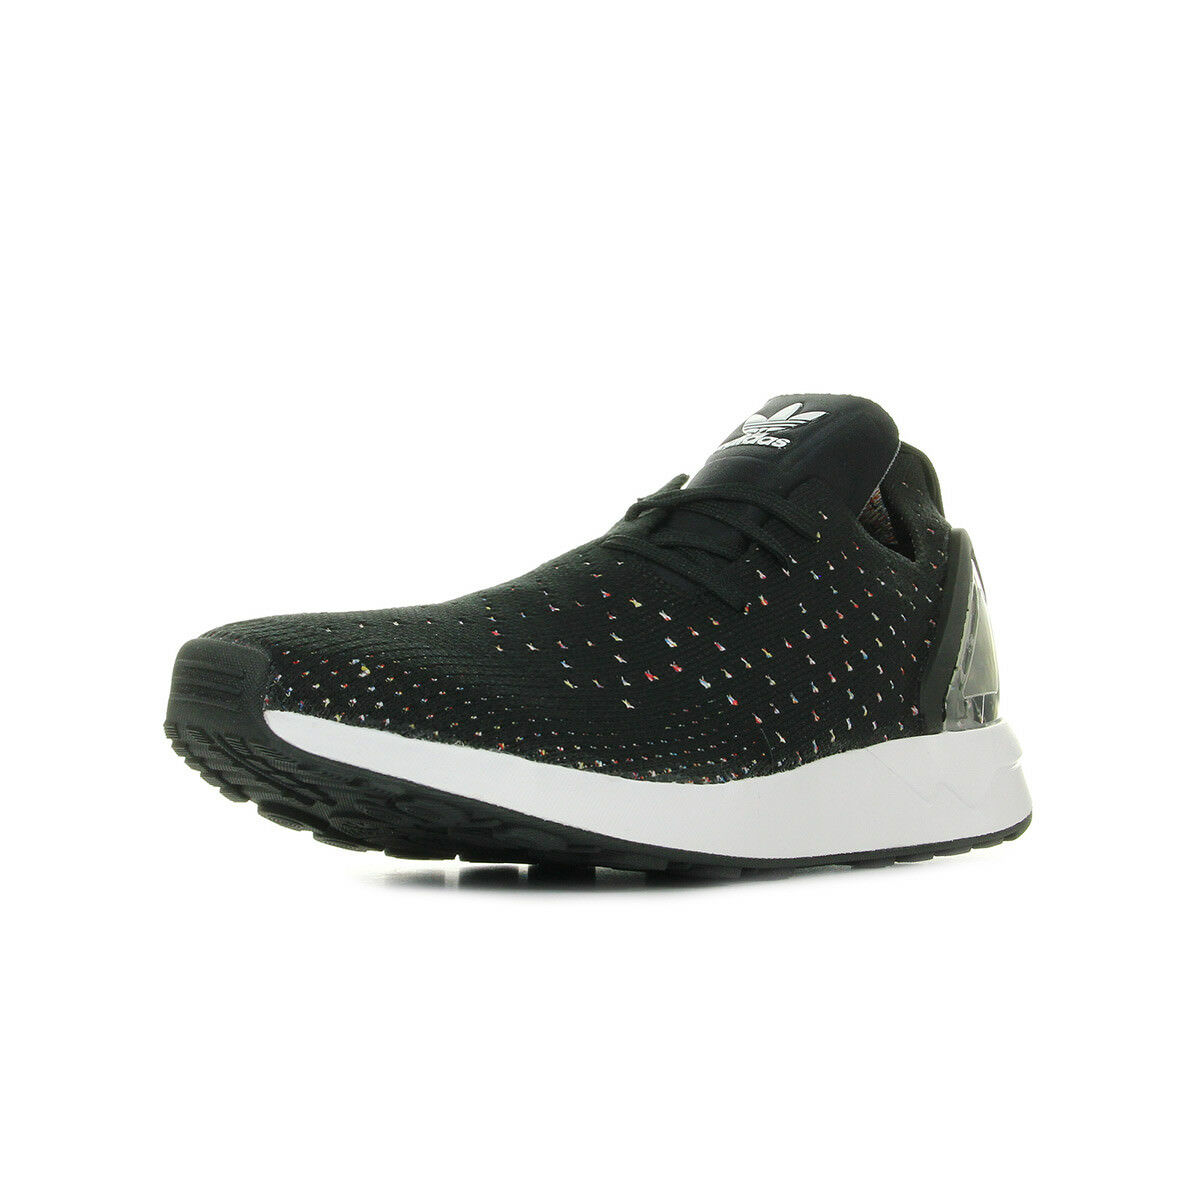 Schuhe adidas Herren ZX Flux Adv Asymetrical Primeknit schwarz